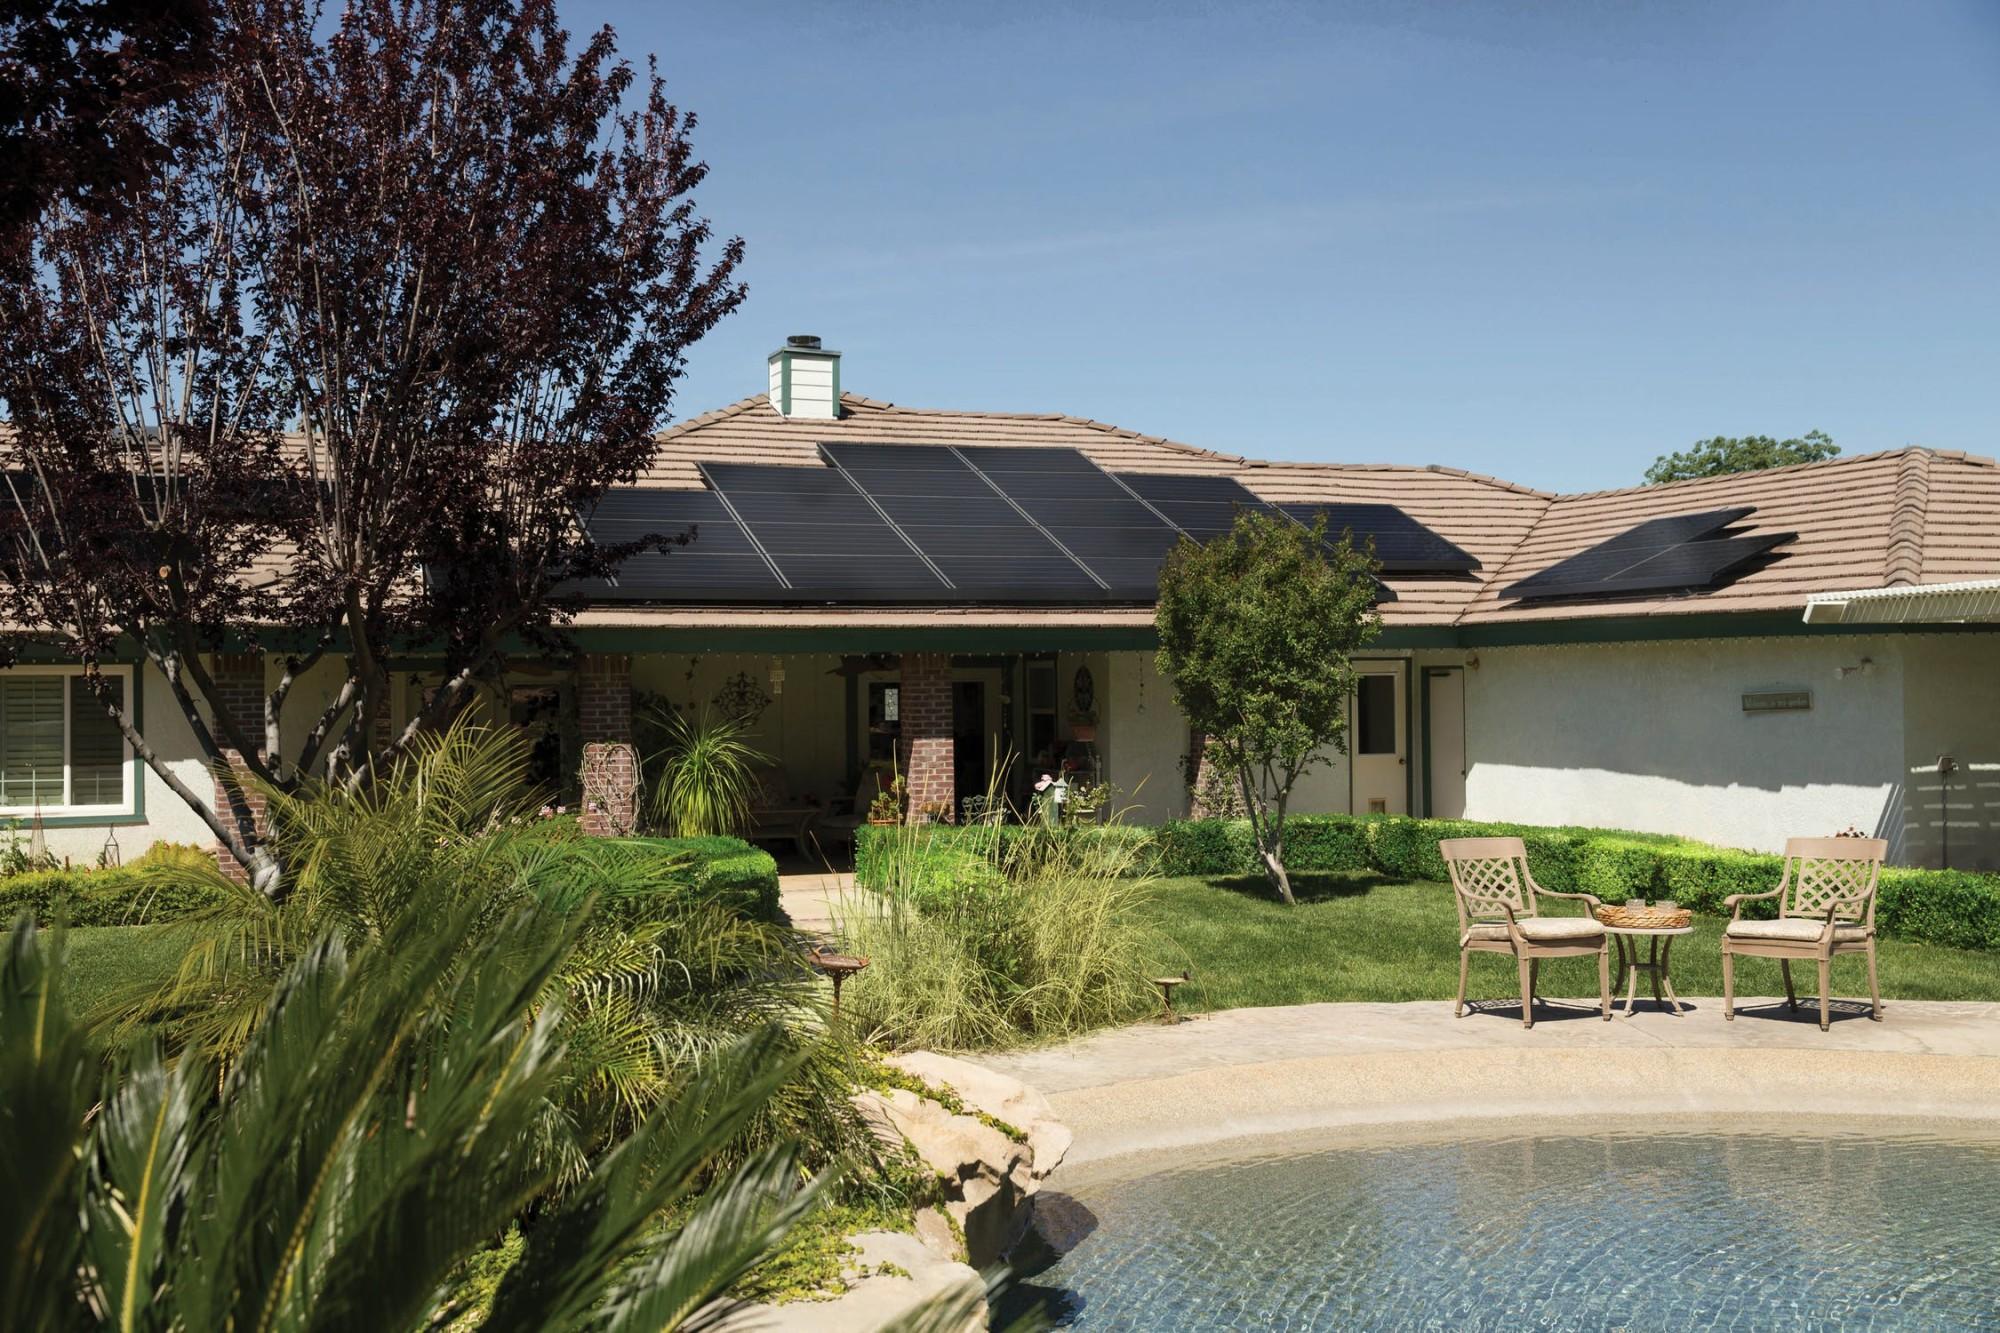 solar power benfits